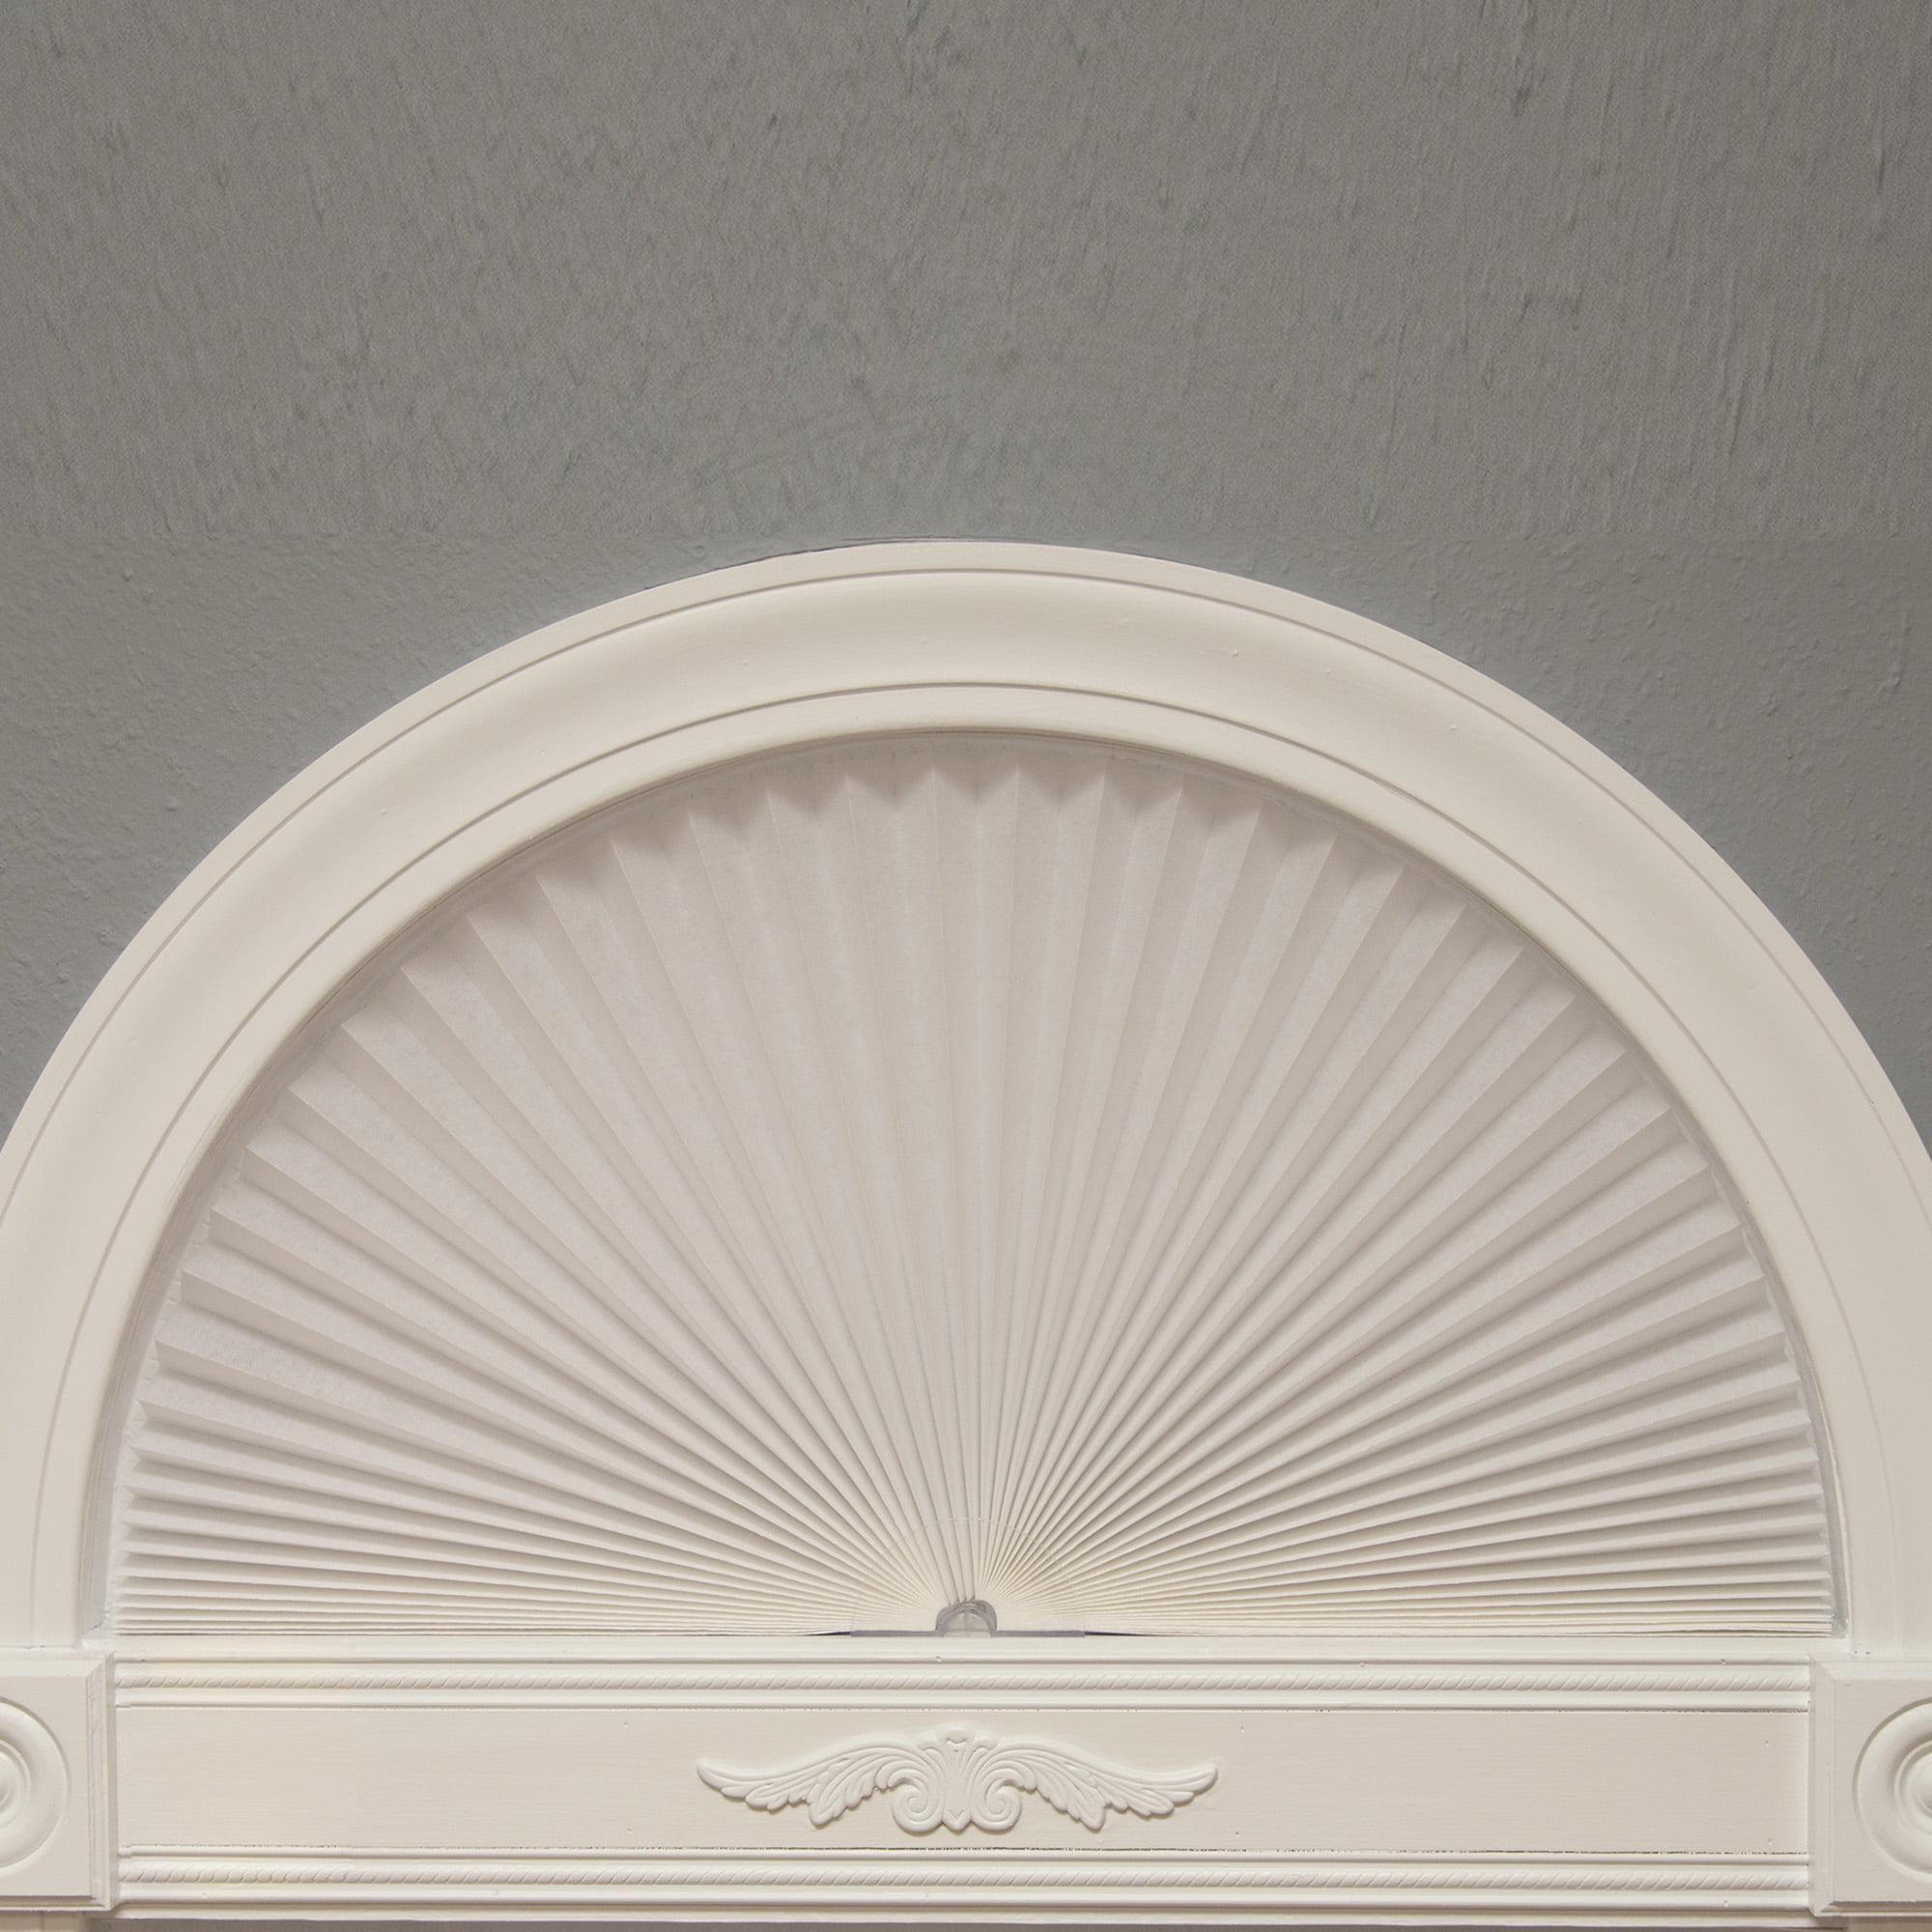 Redi Shade Original Arch Light Filtering Pleated Fabric, White